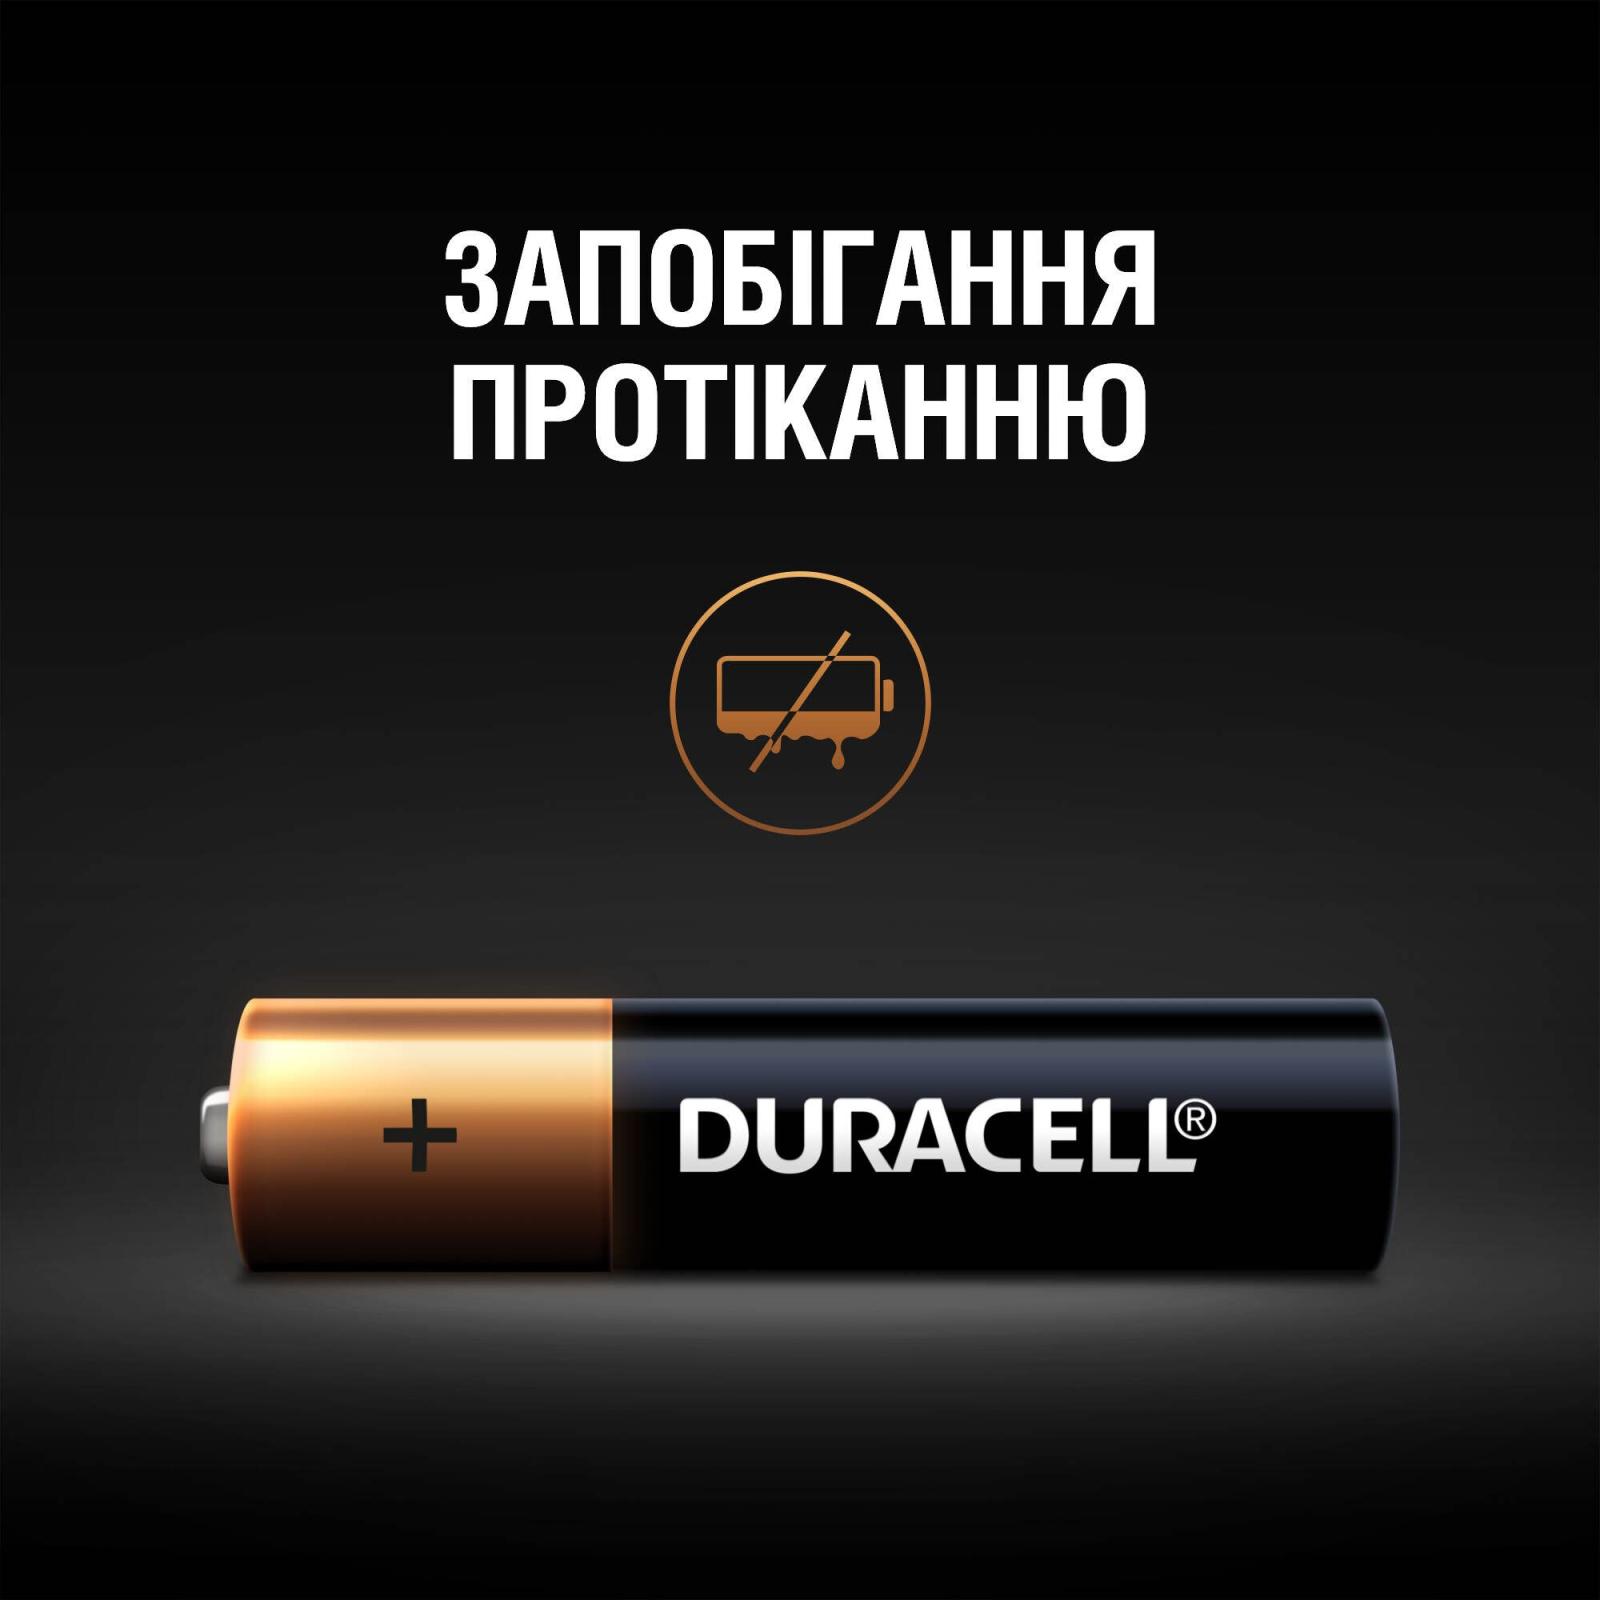 Батарейка Duracell AAA MN2400 LR03 * 6 (5000394107472 / 81483511) изображение 6